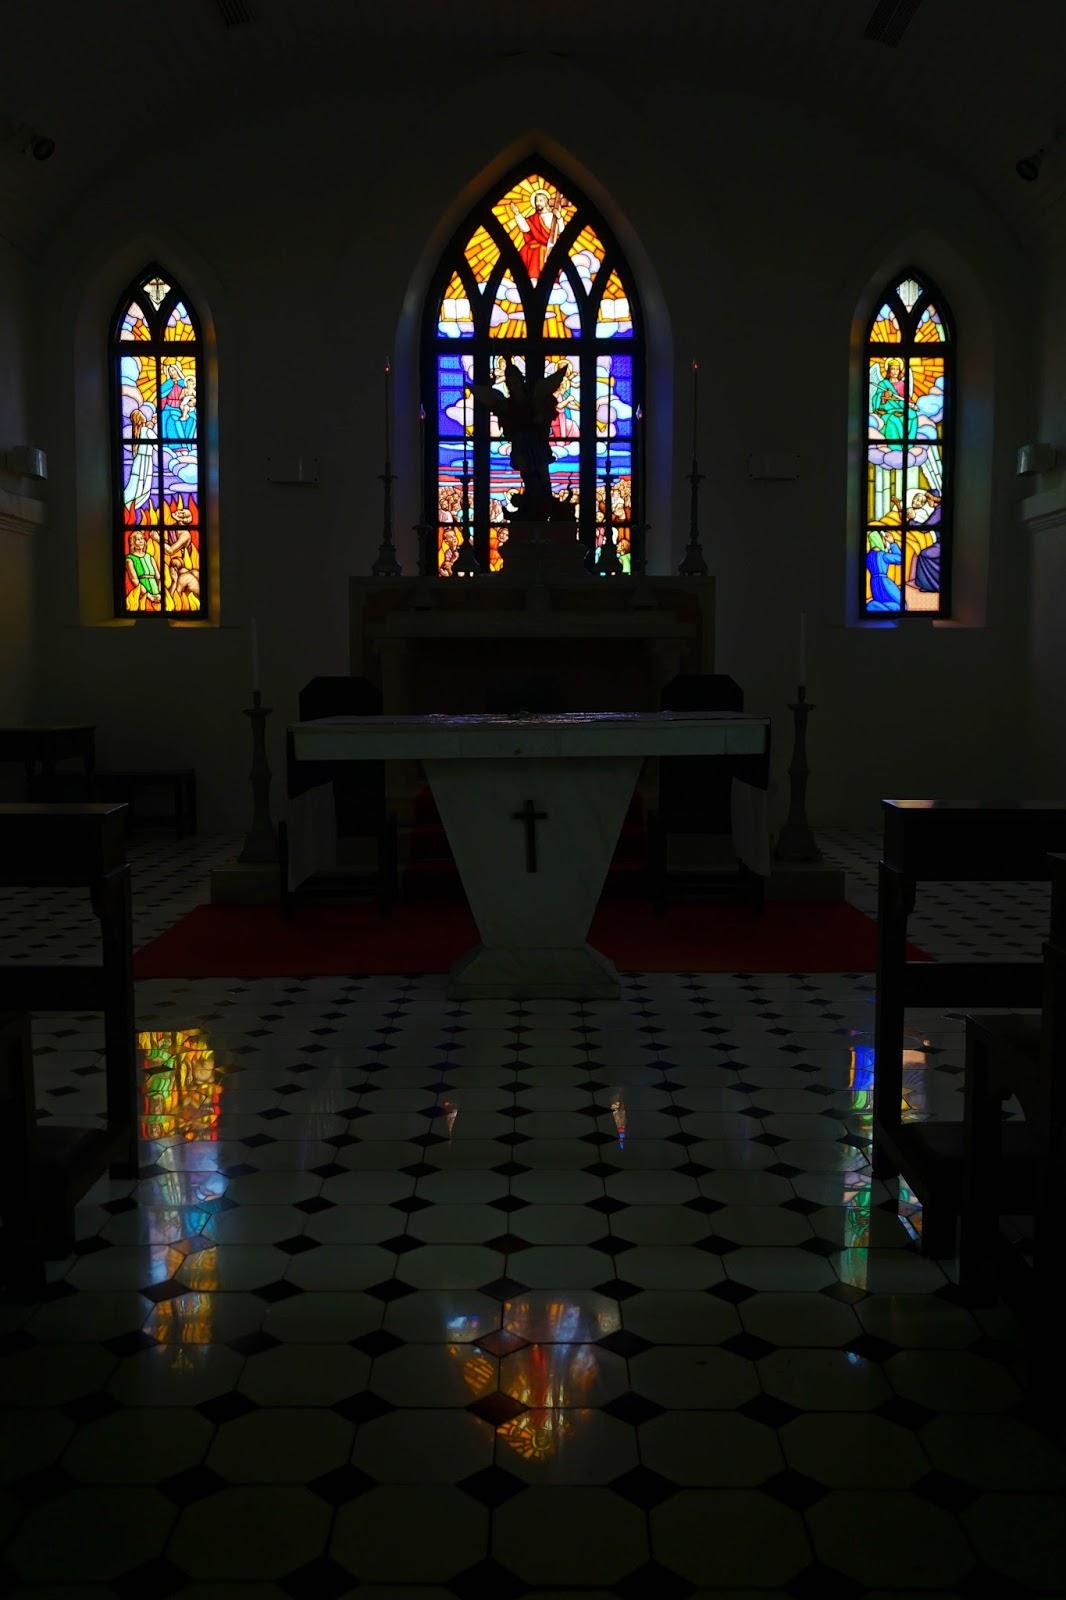 beautyanxiety.com-St. Michael's Chapel and Cemetery-beautyanxiety.com-St.%2BMichael%2527s%2BChapel%2Band%2BCemetery-DSC09996.jpg